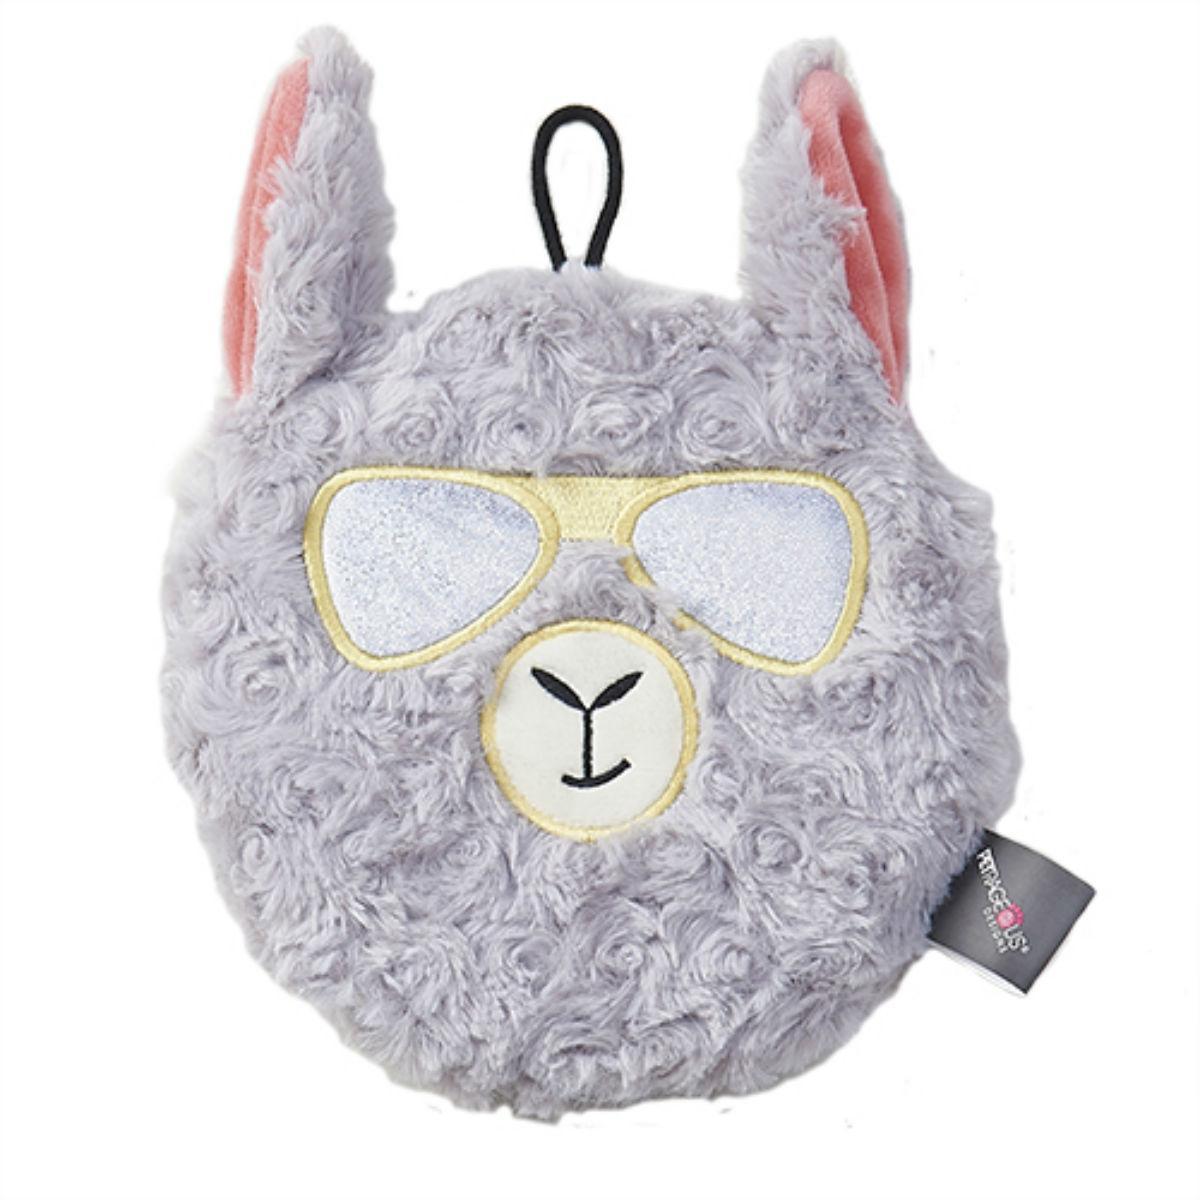 FabRageous Squeaker Disc Dog Toy - Llama